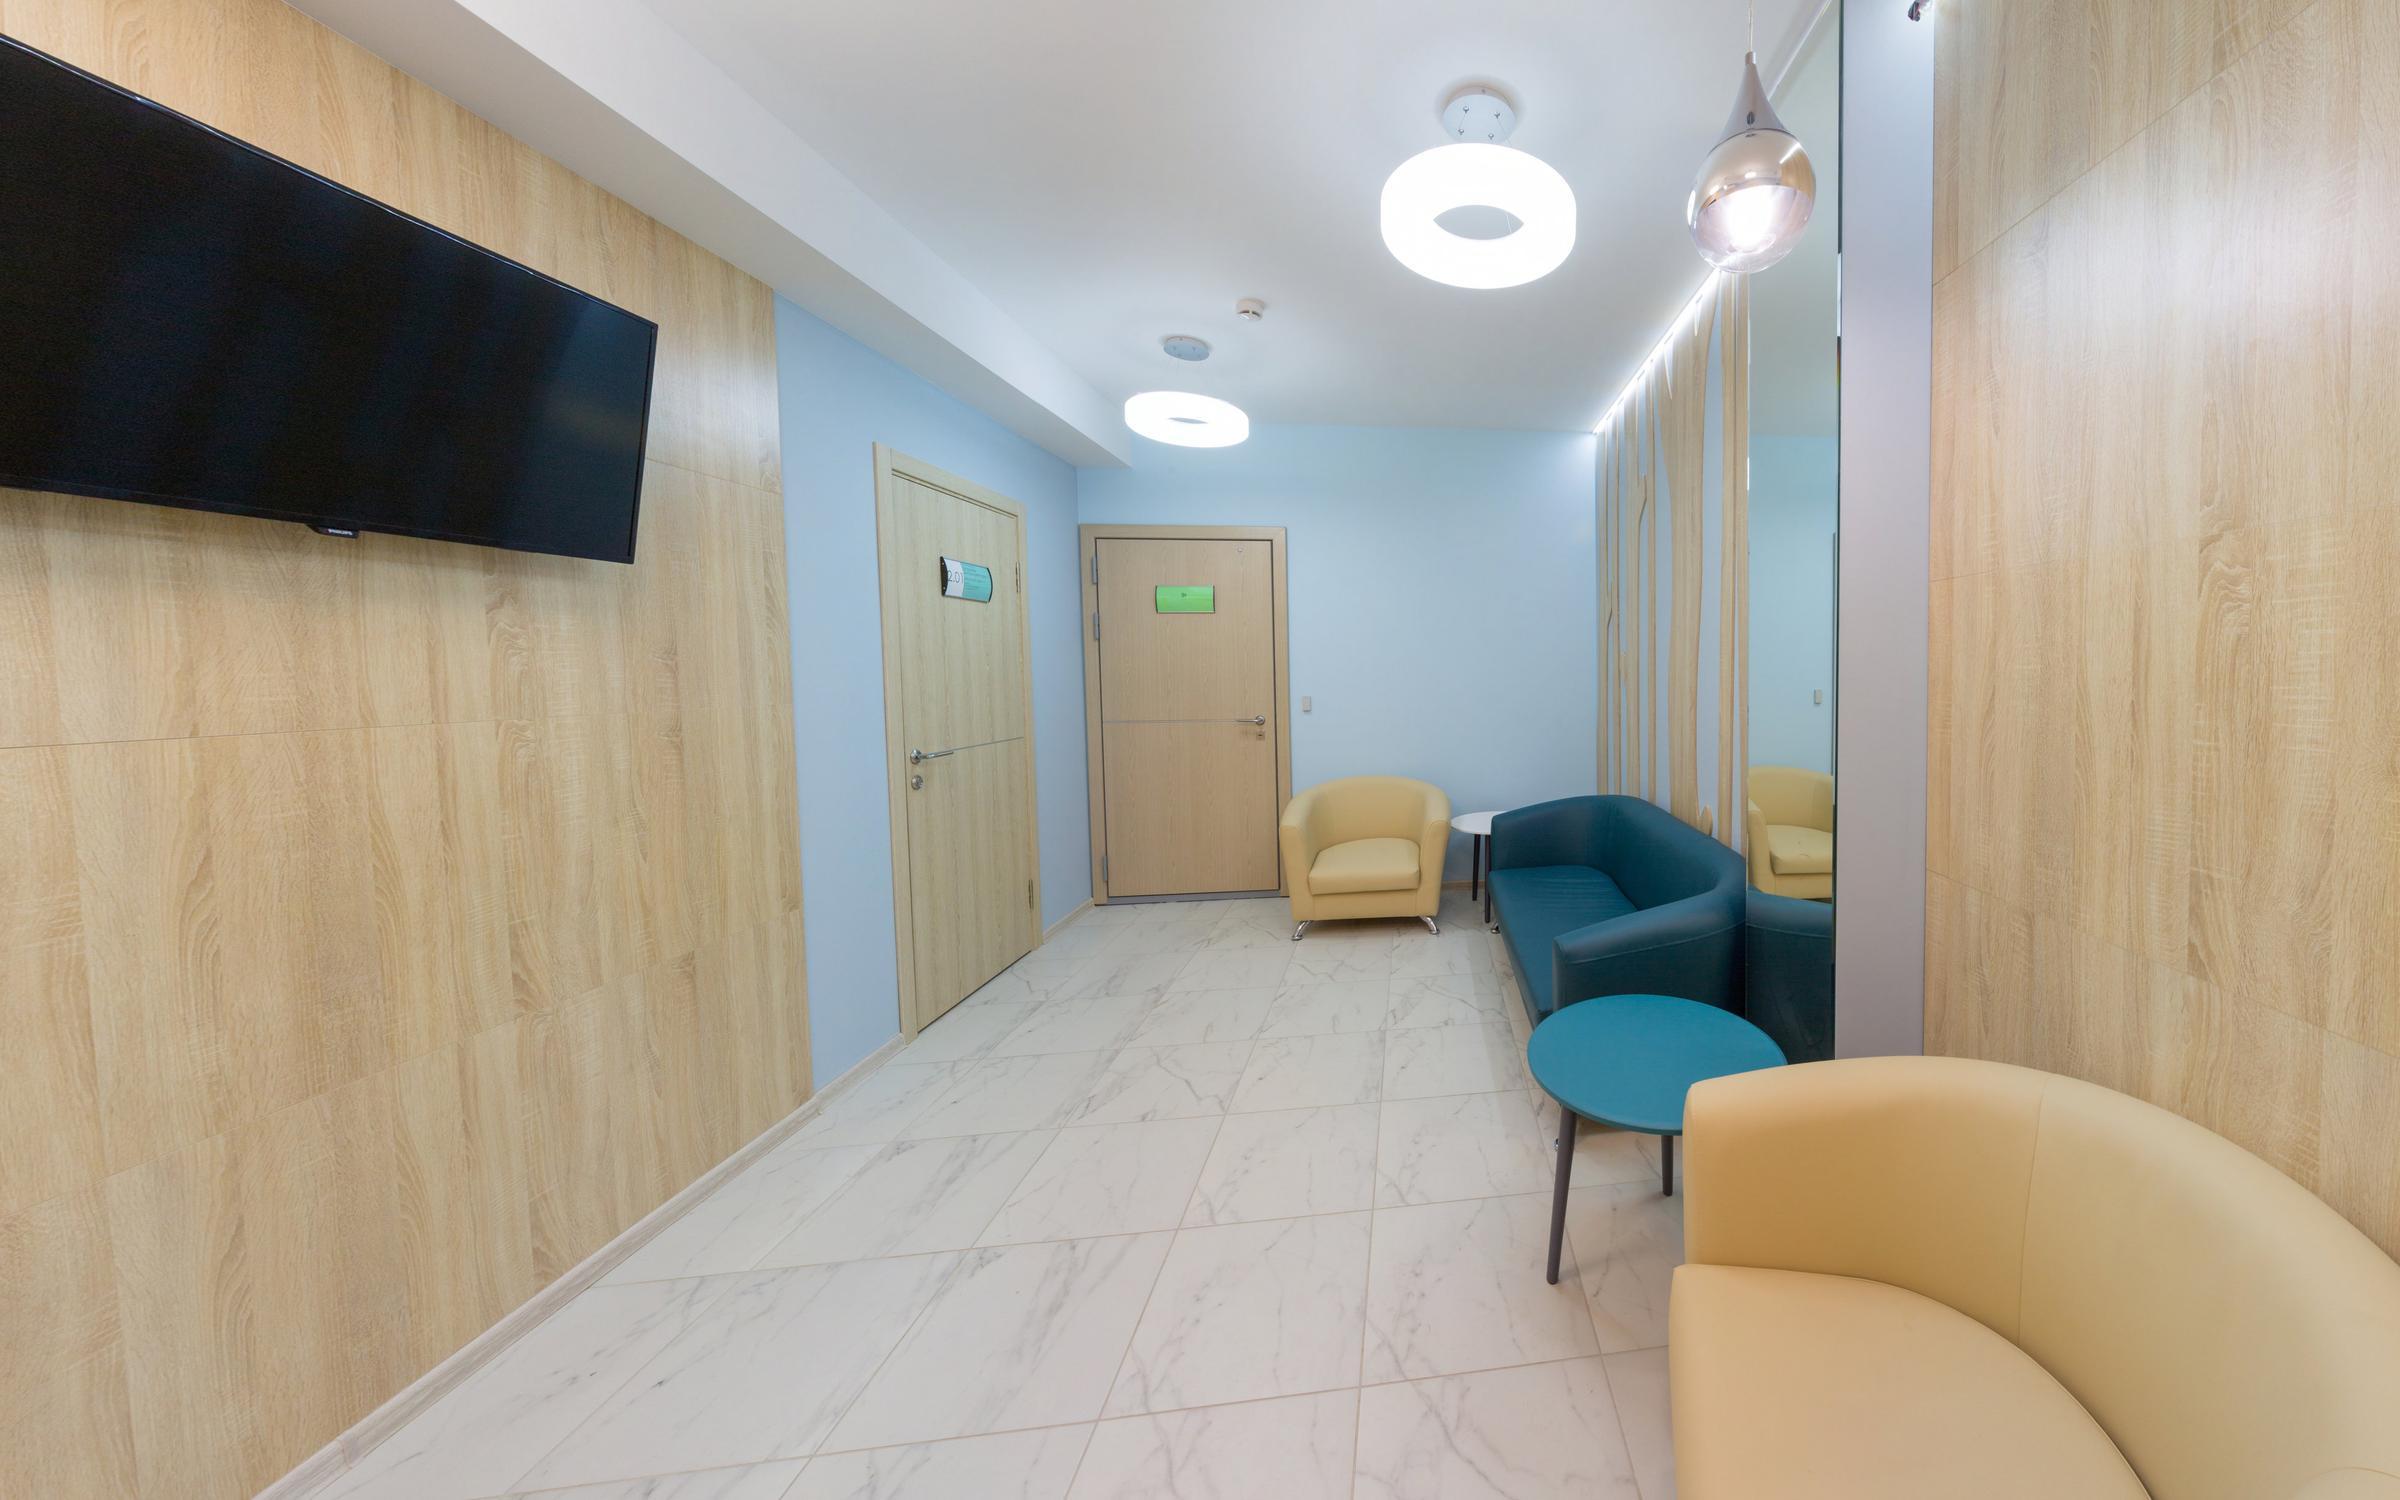 Камера в кабинете мамолога в контакте